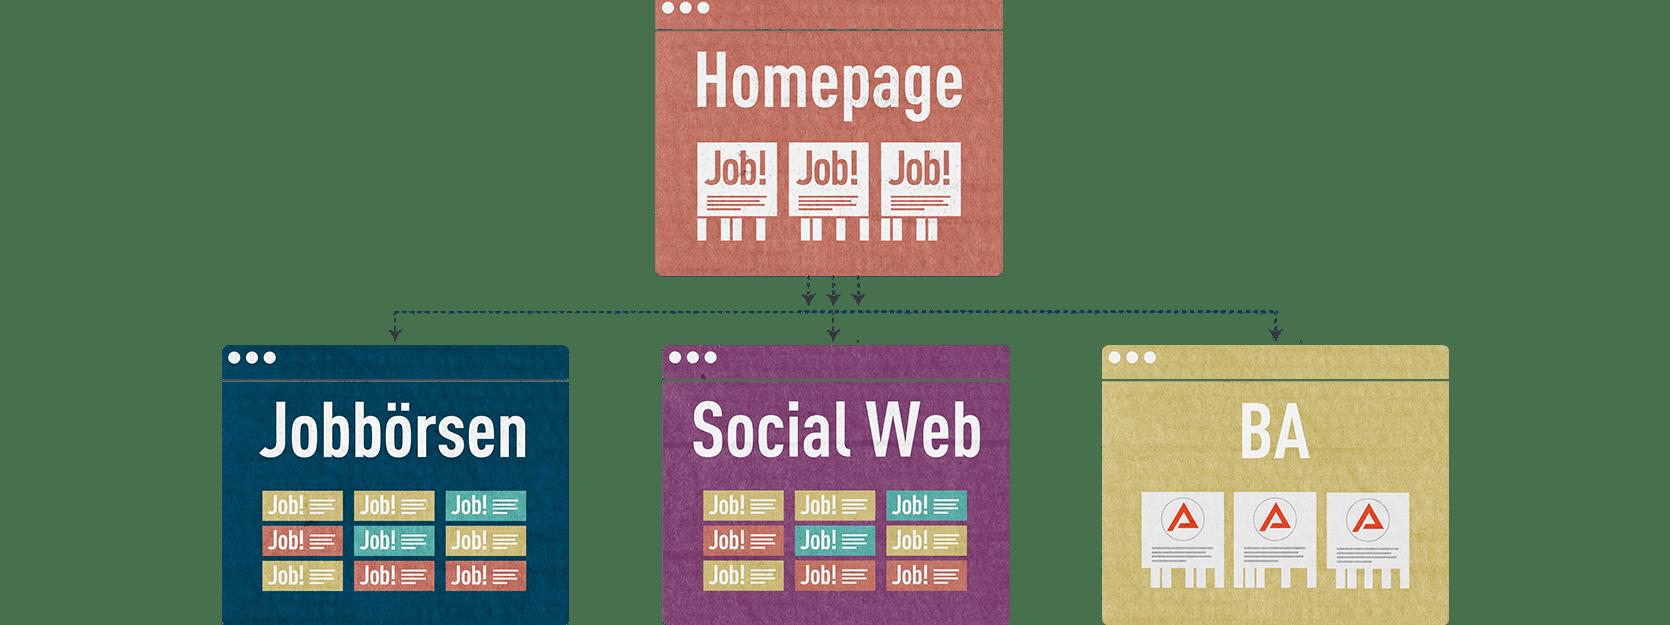 jobspreader personalmarketing toolbox ohnefb Jobspreader   Personalmarketing Tools